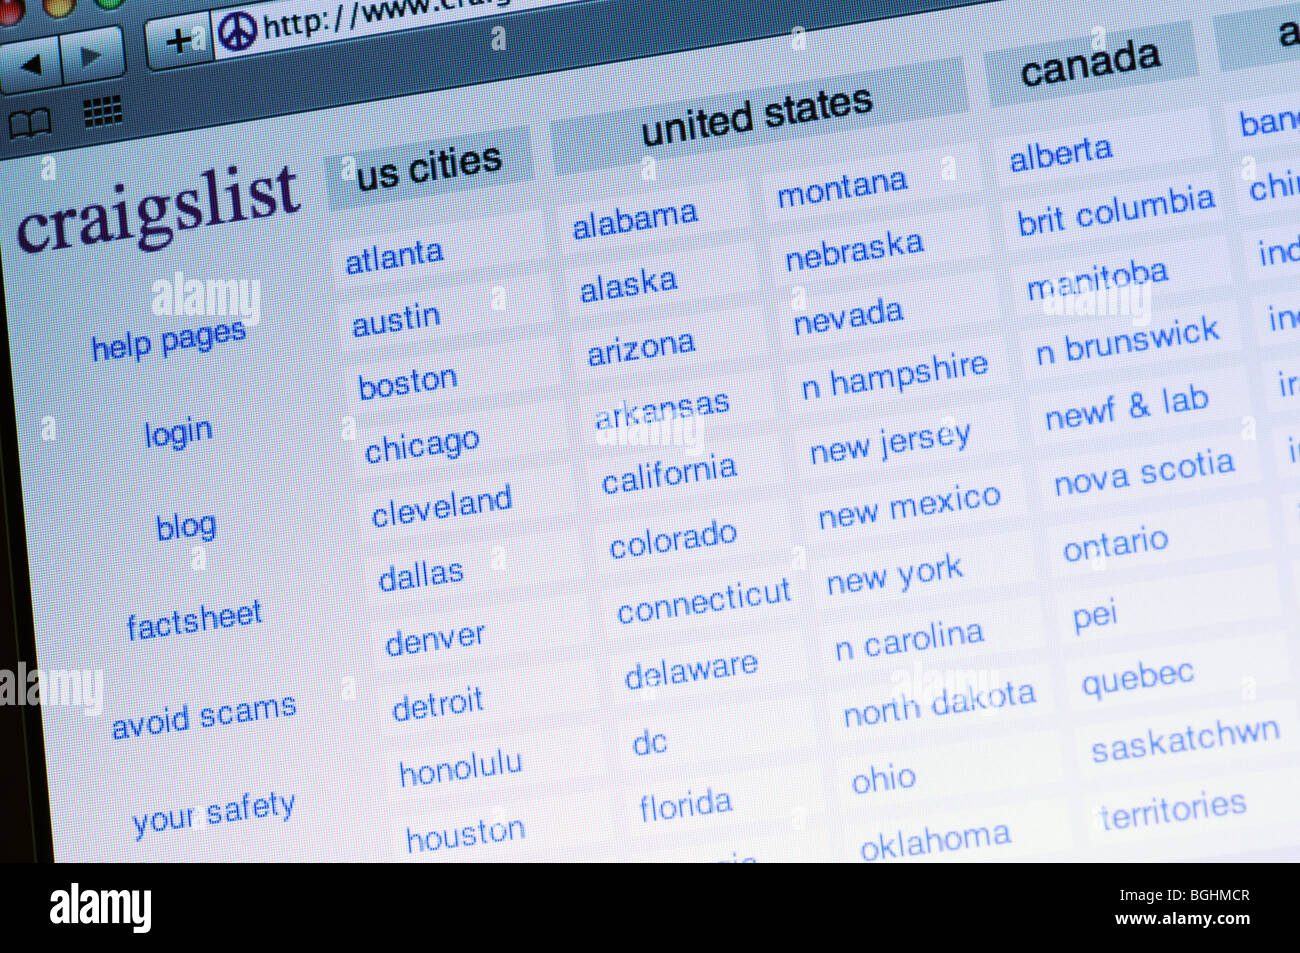 Craigslist website Stock Photo: 27434087 - Alamy